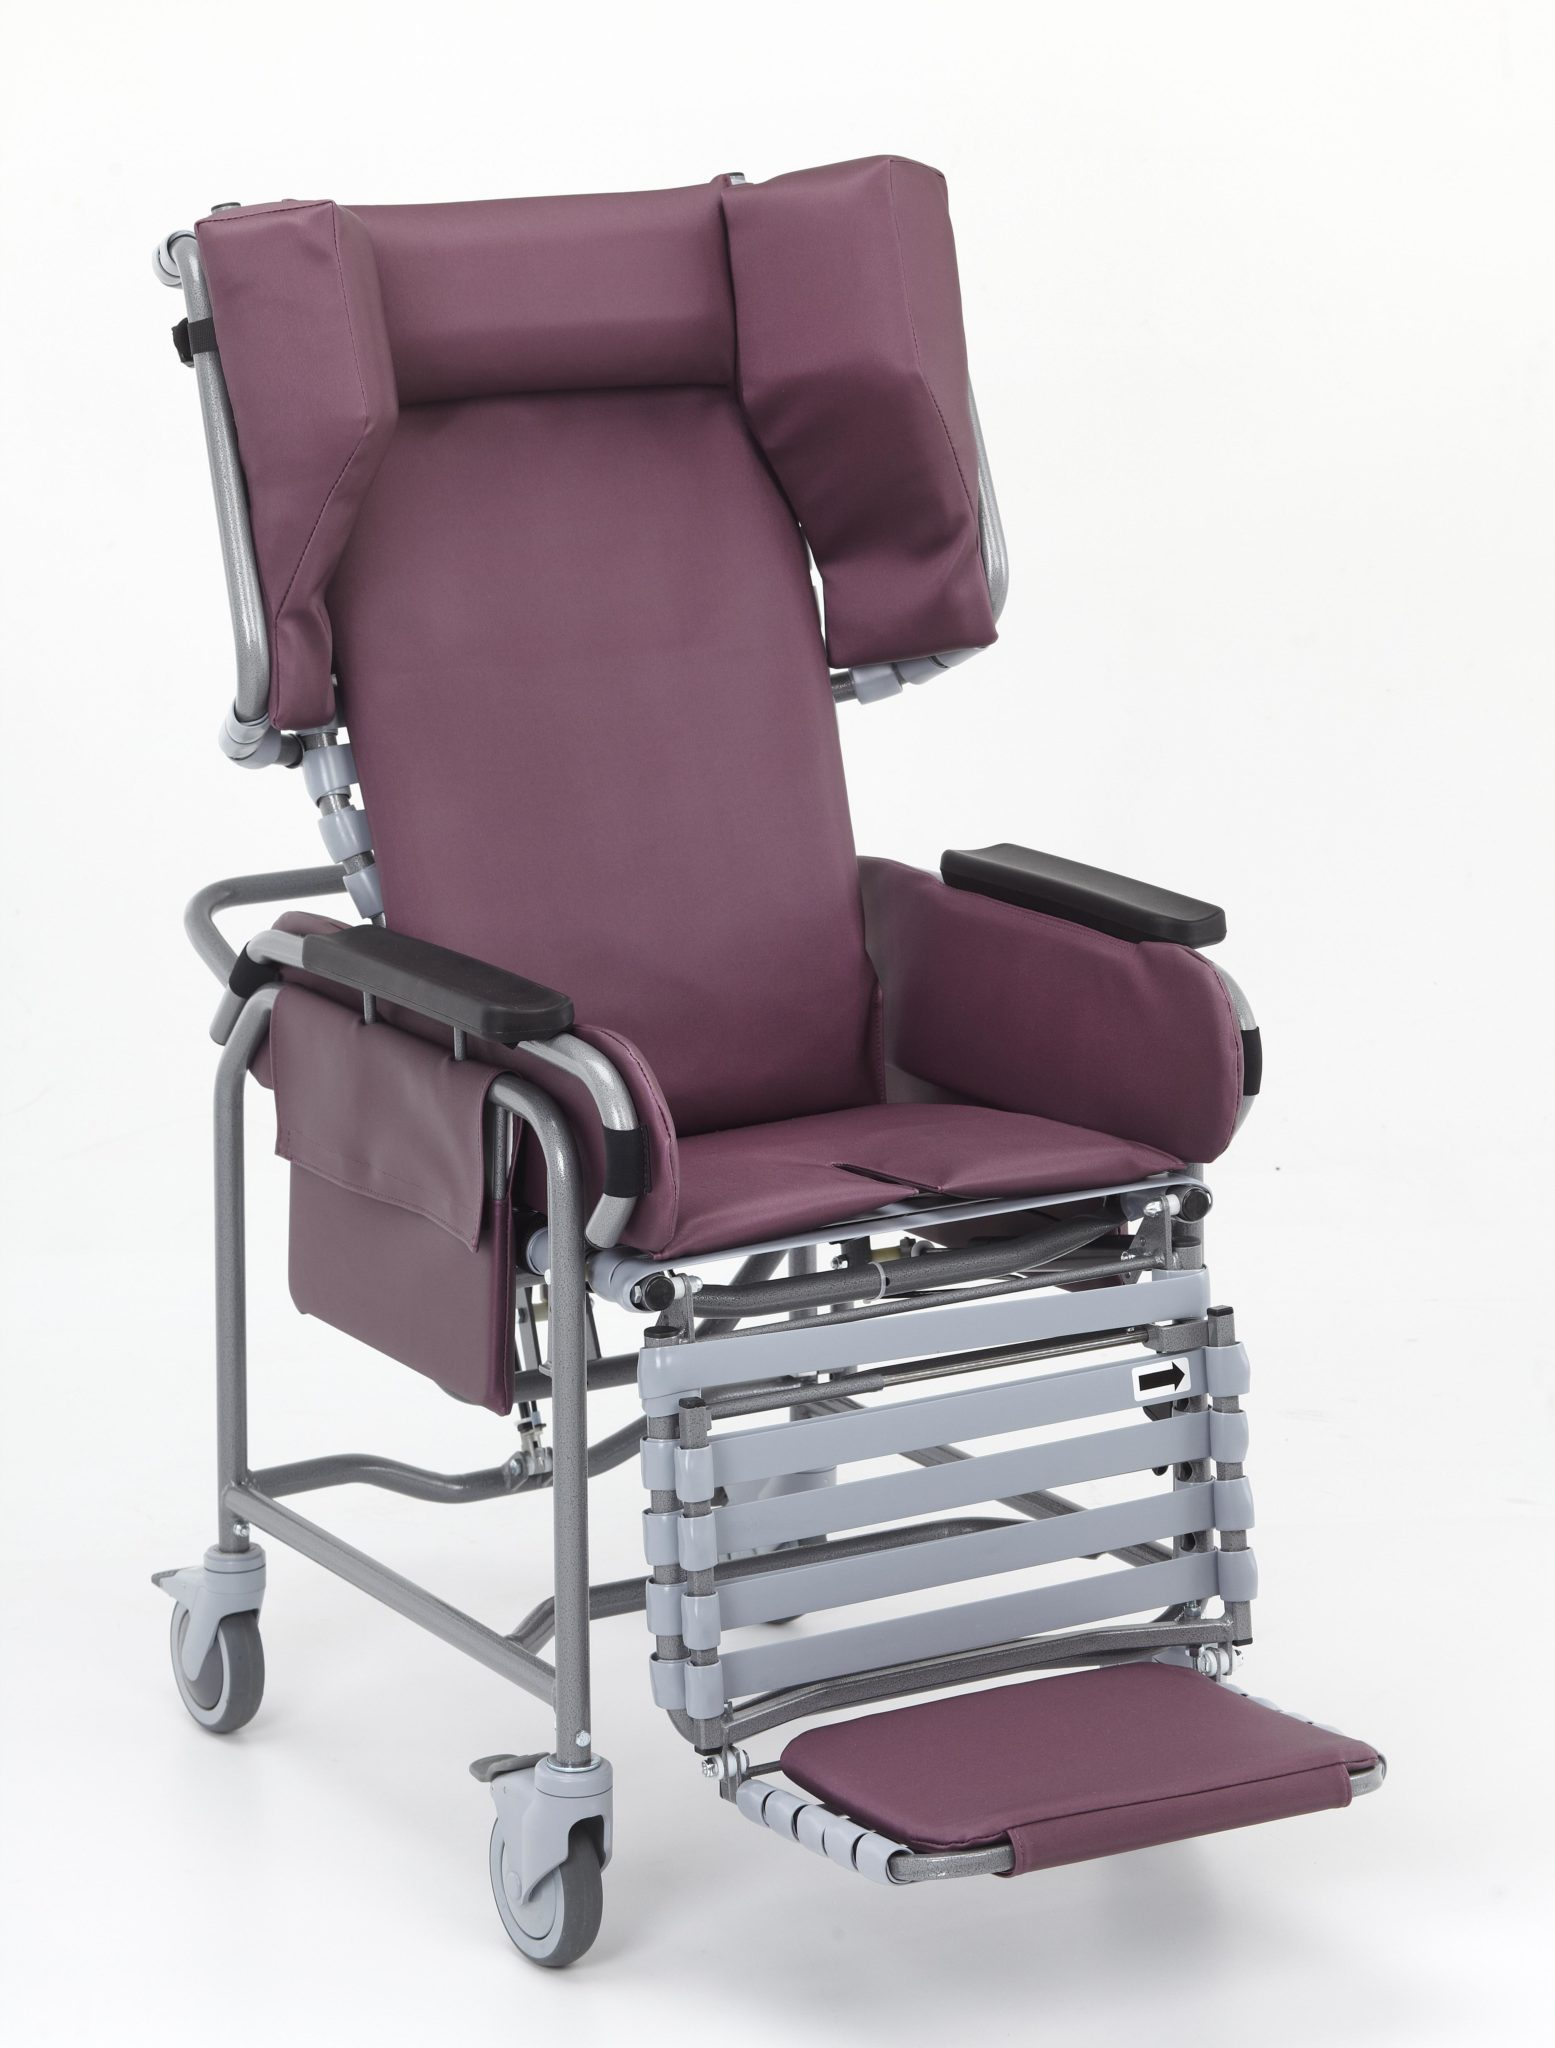 wheel chair for sale swivel pottery barn broda chairs st paul mn corner home medical